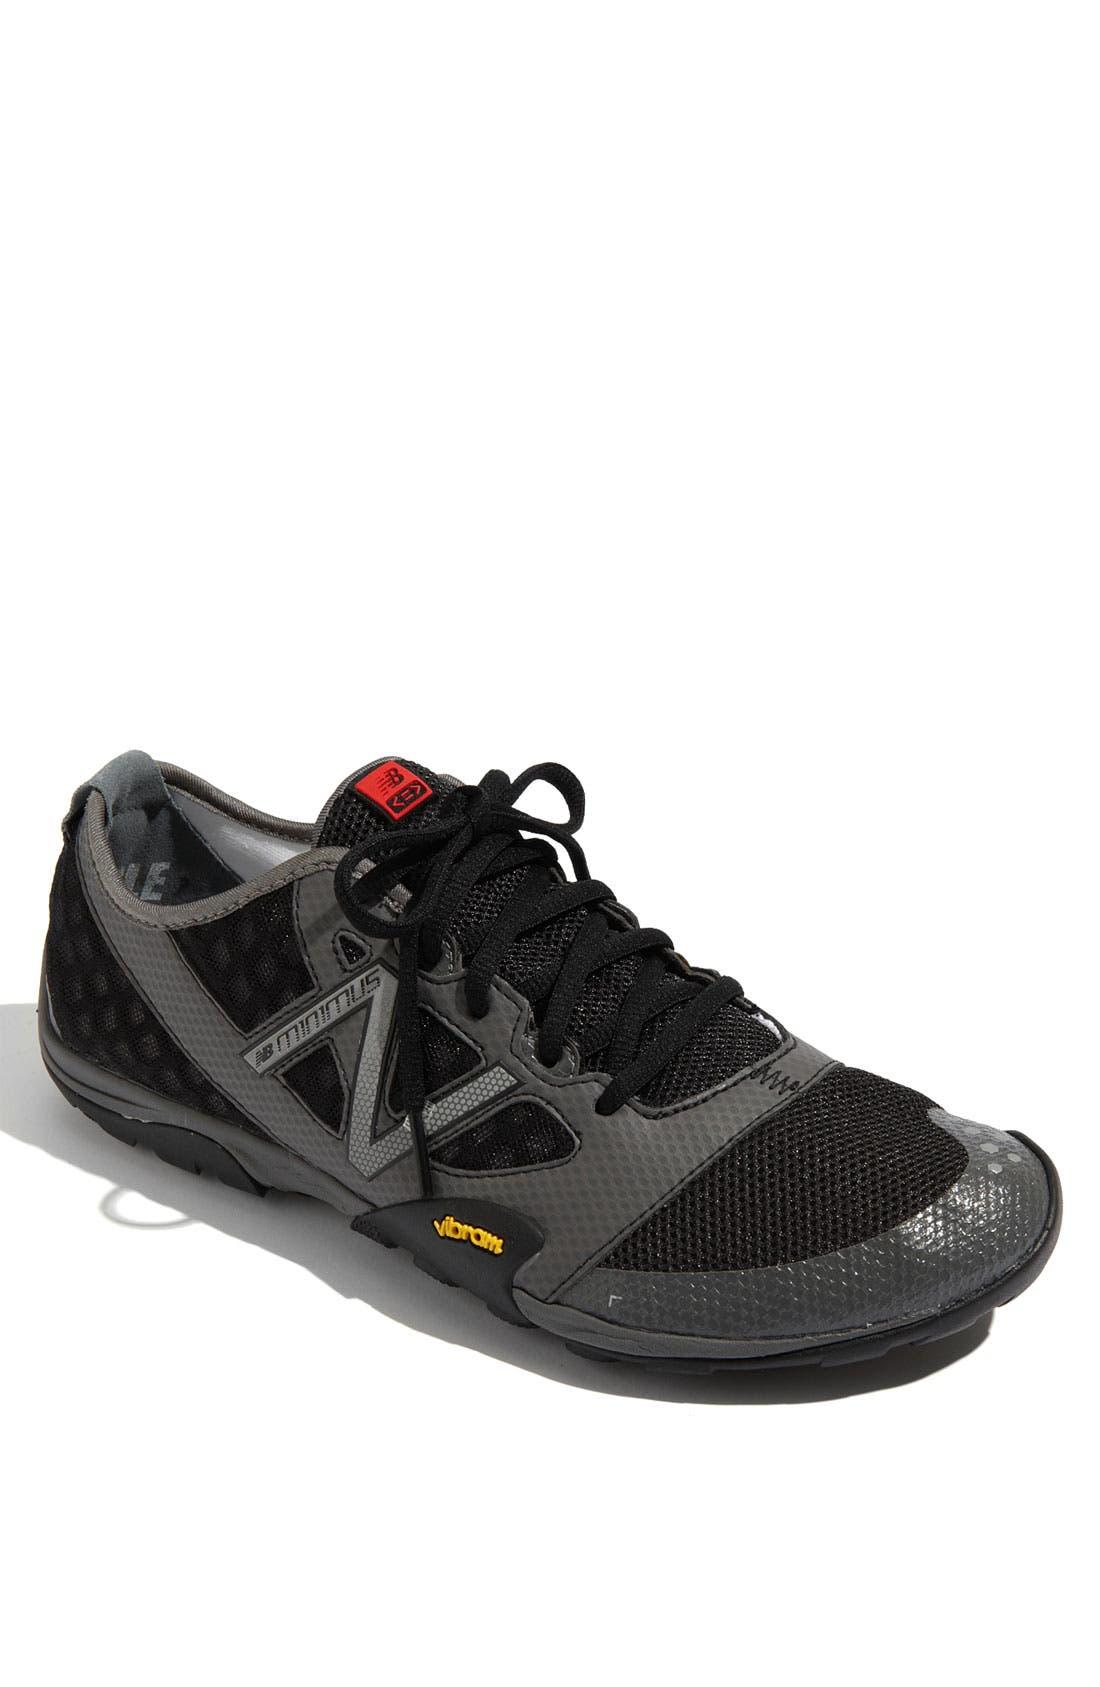 Main Image - New Balance 'MT 20 Minimus' Running Shoe (Men)